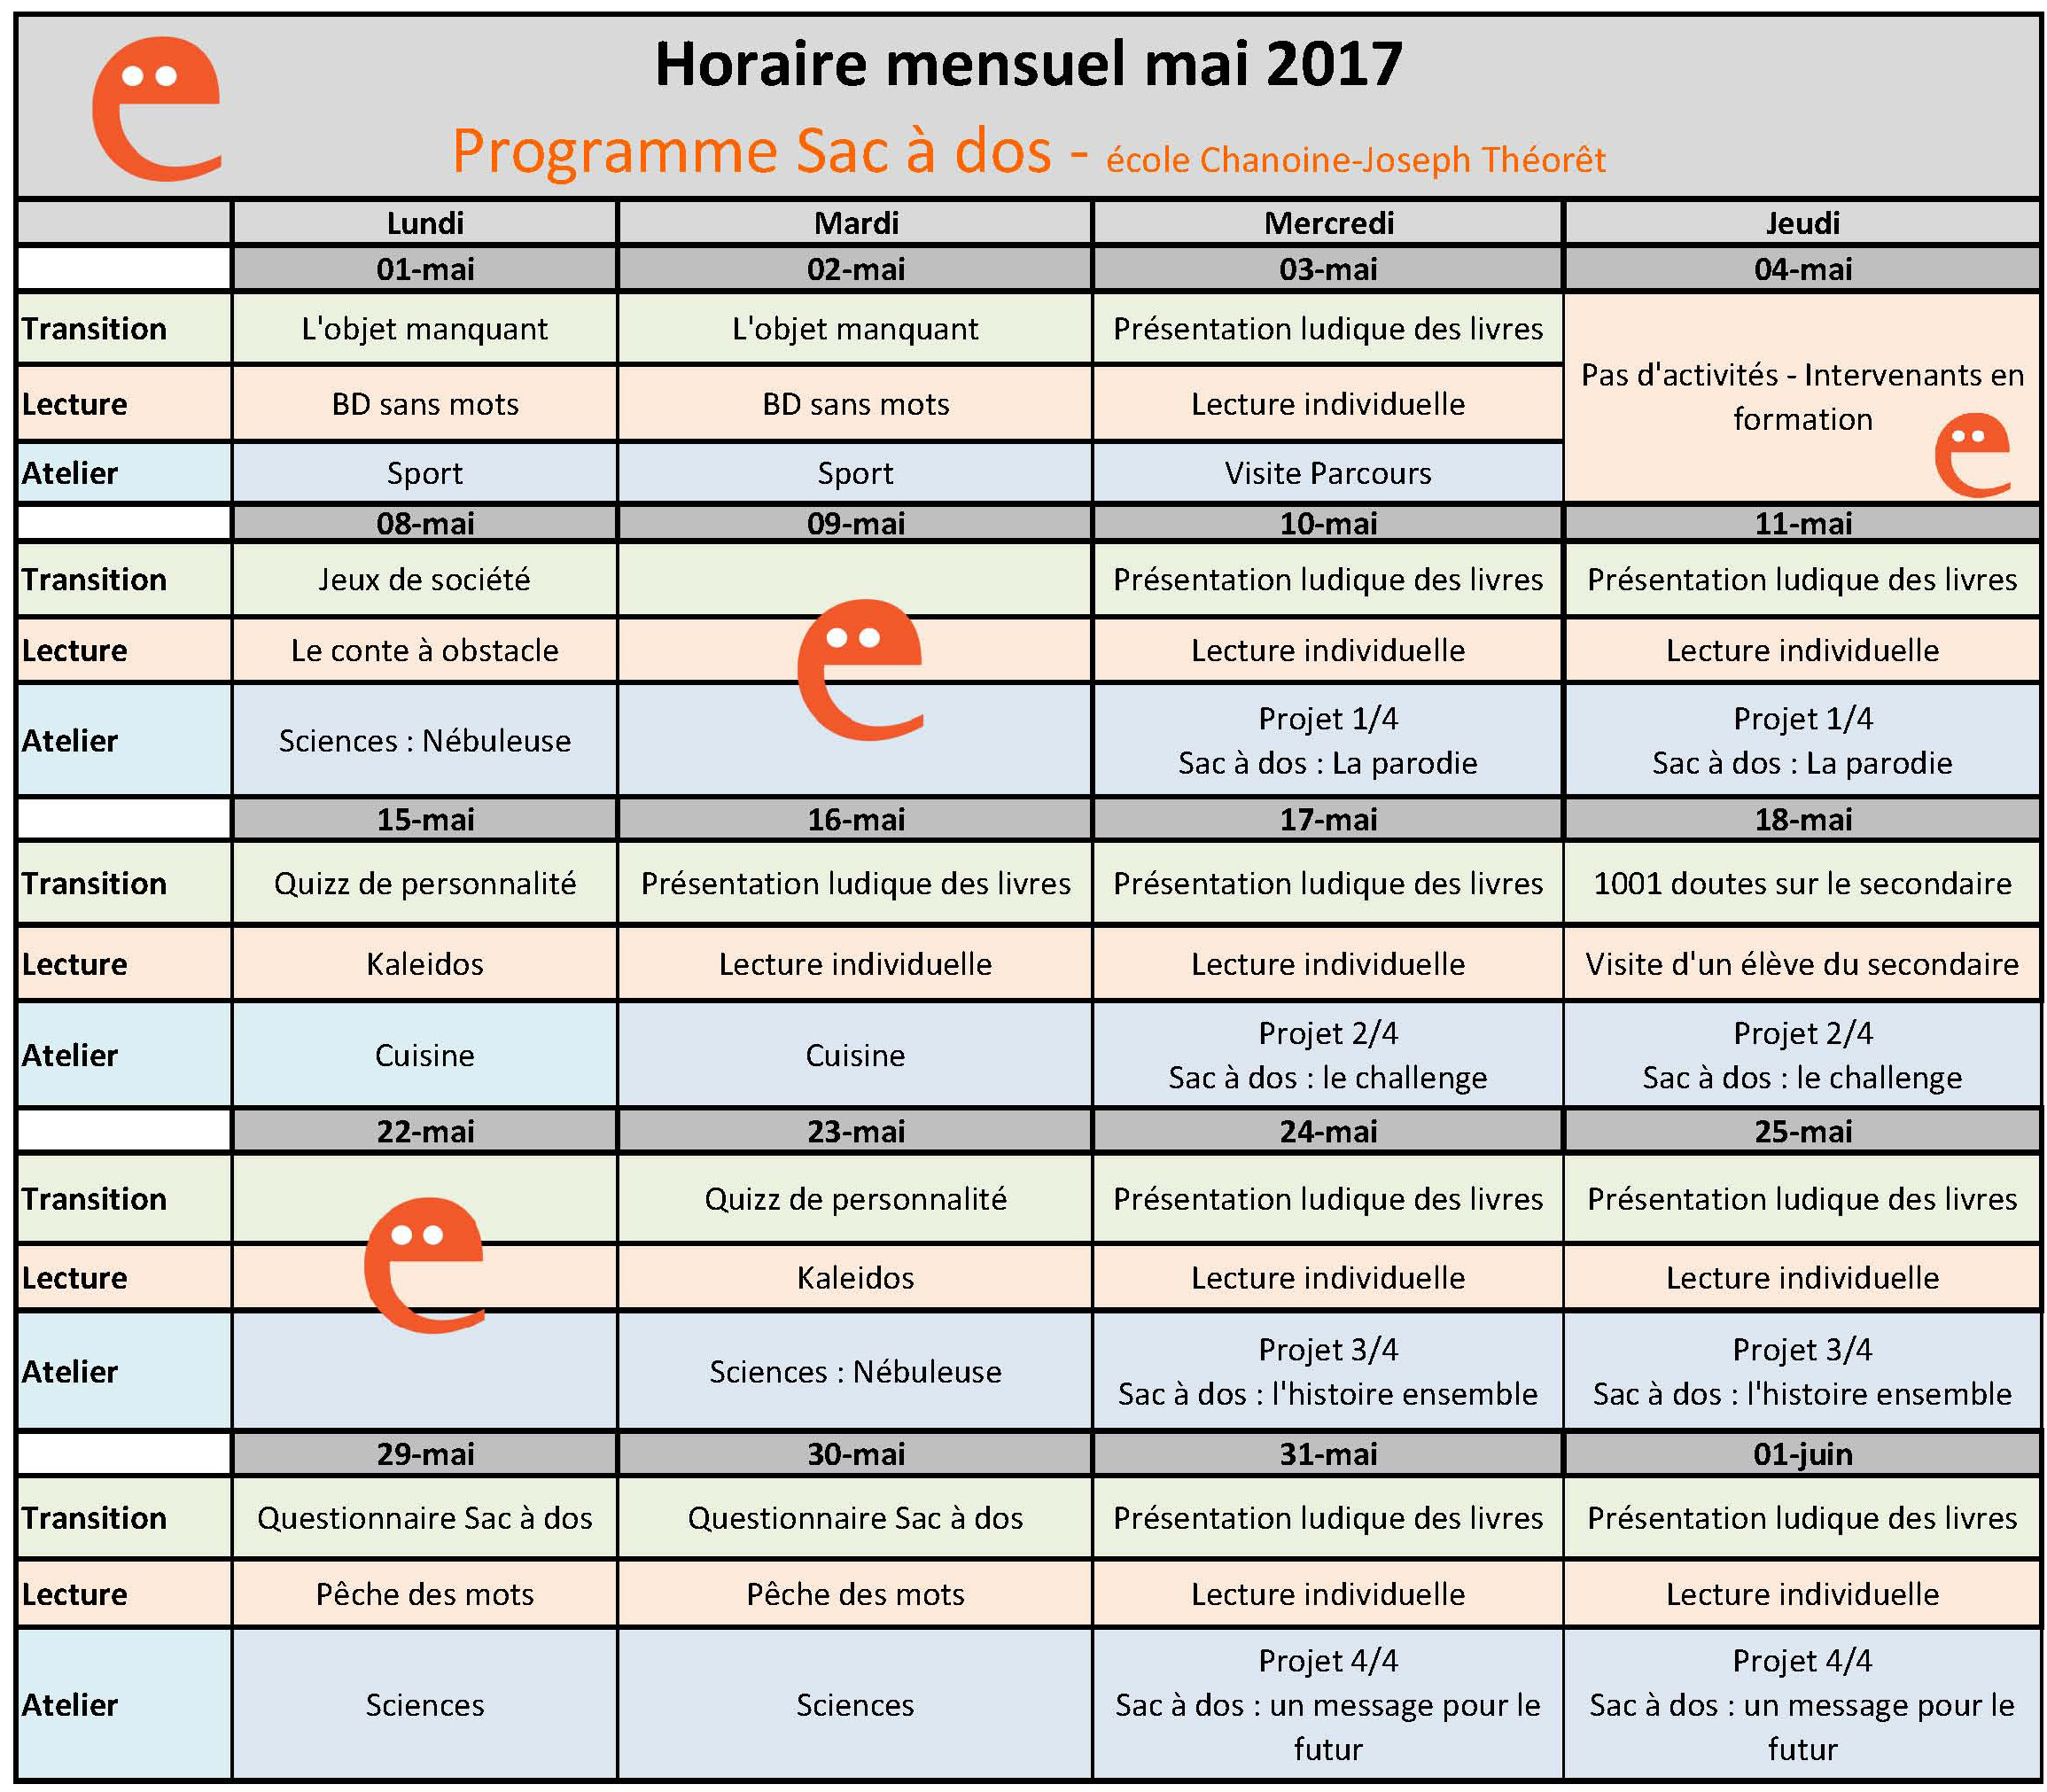 Horaire mensuel mai 2017 - Chanoine-Joseph-Théorêt - Programme Sac à dos